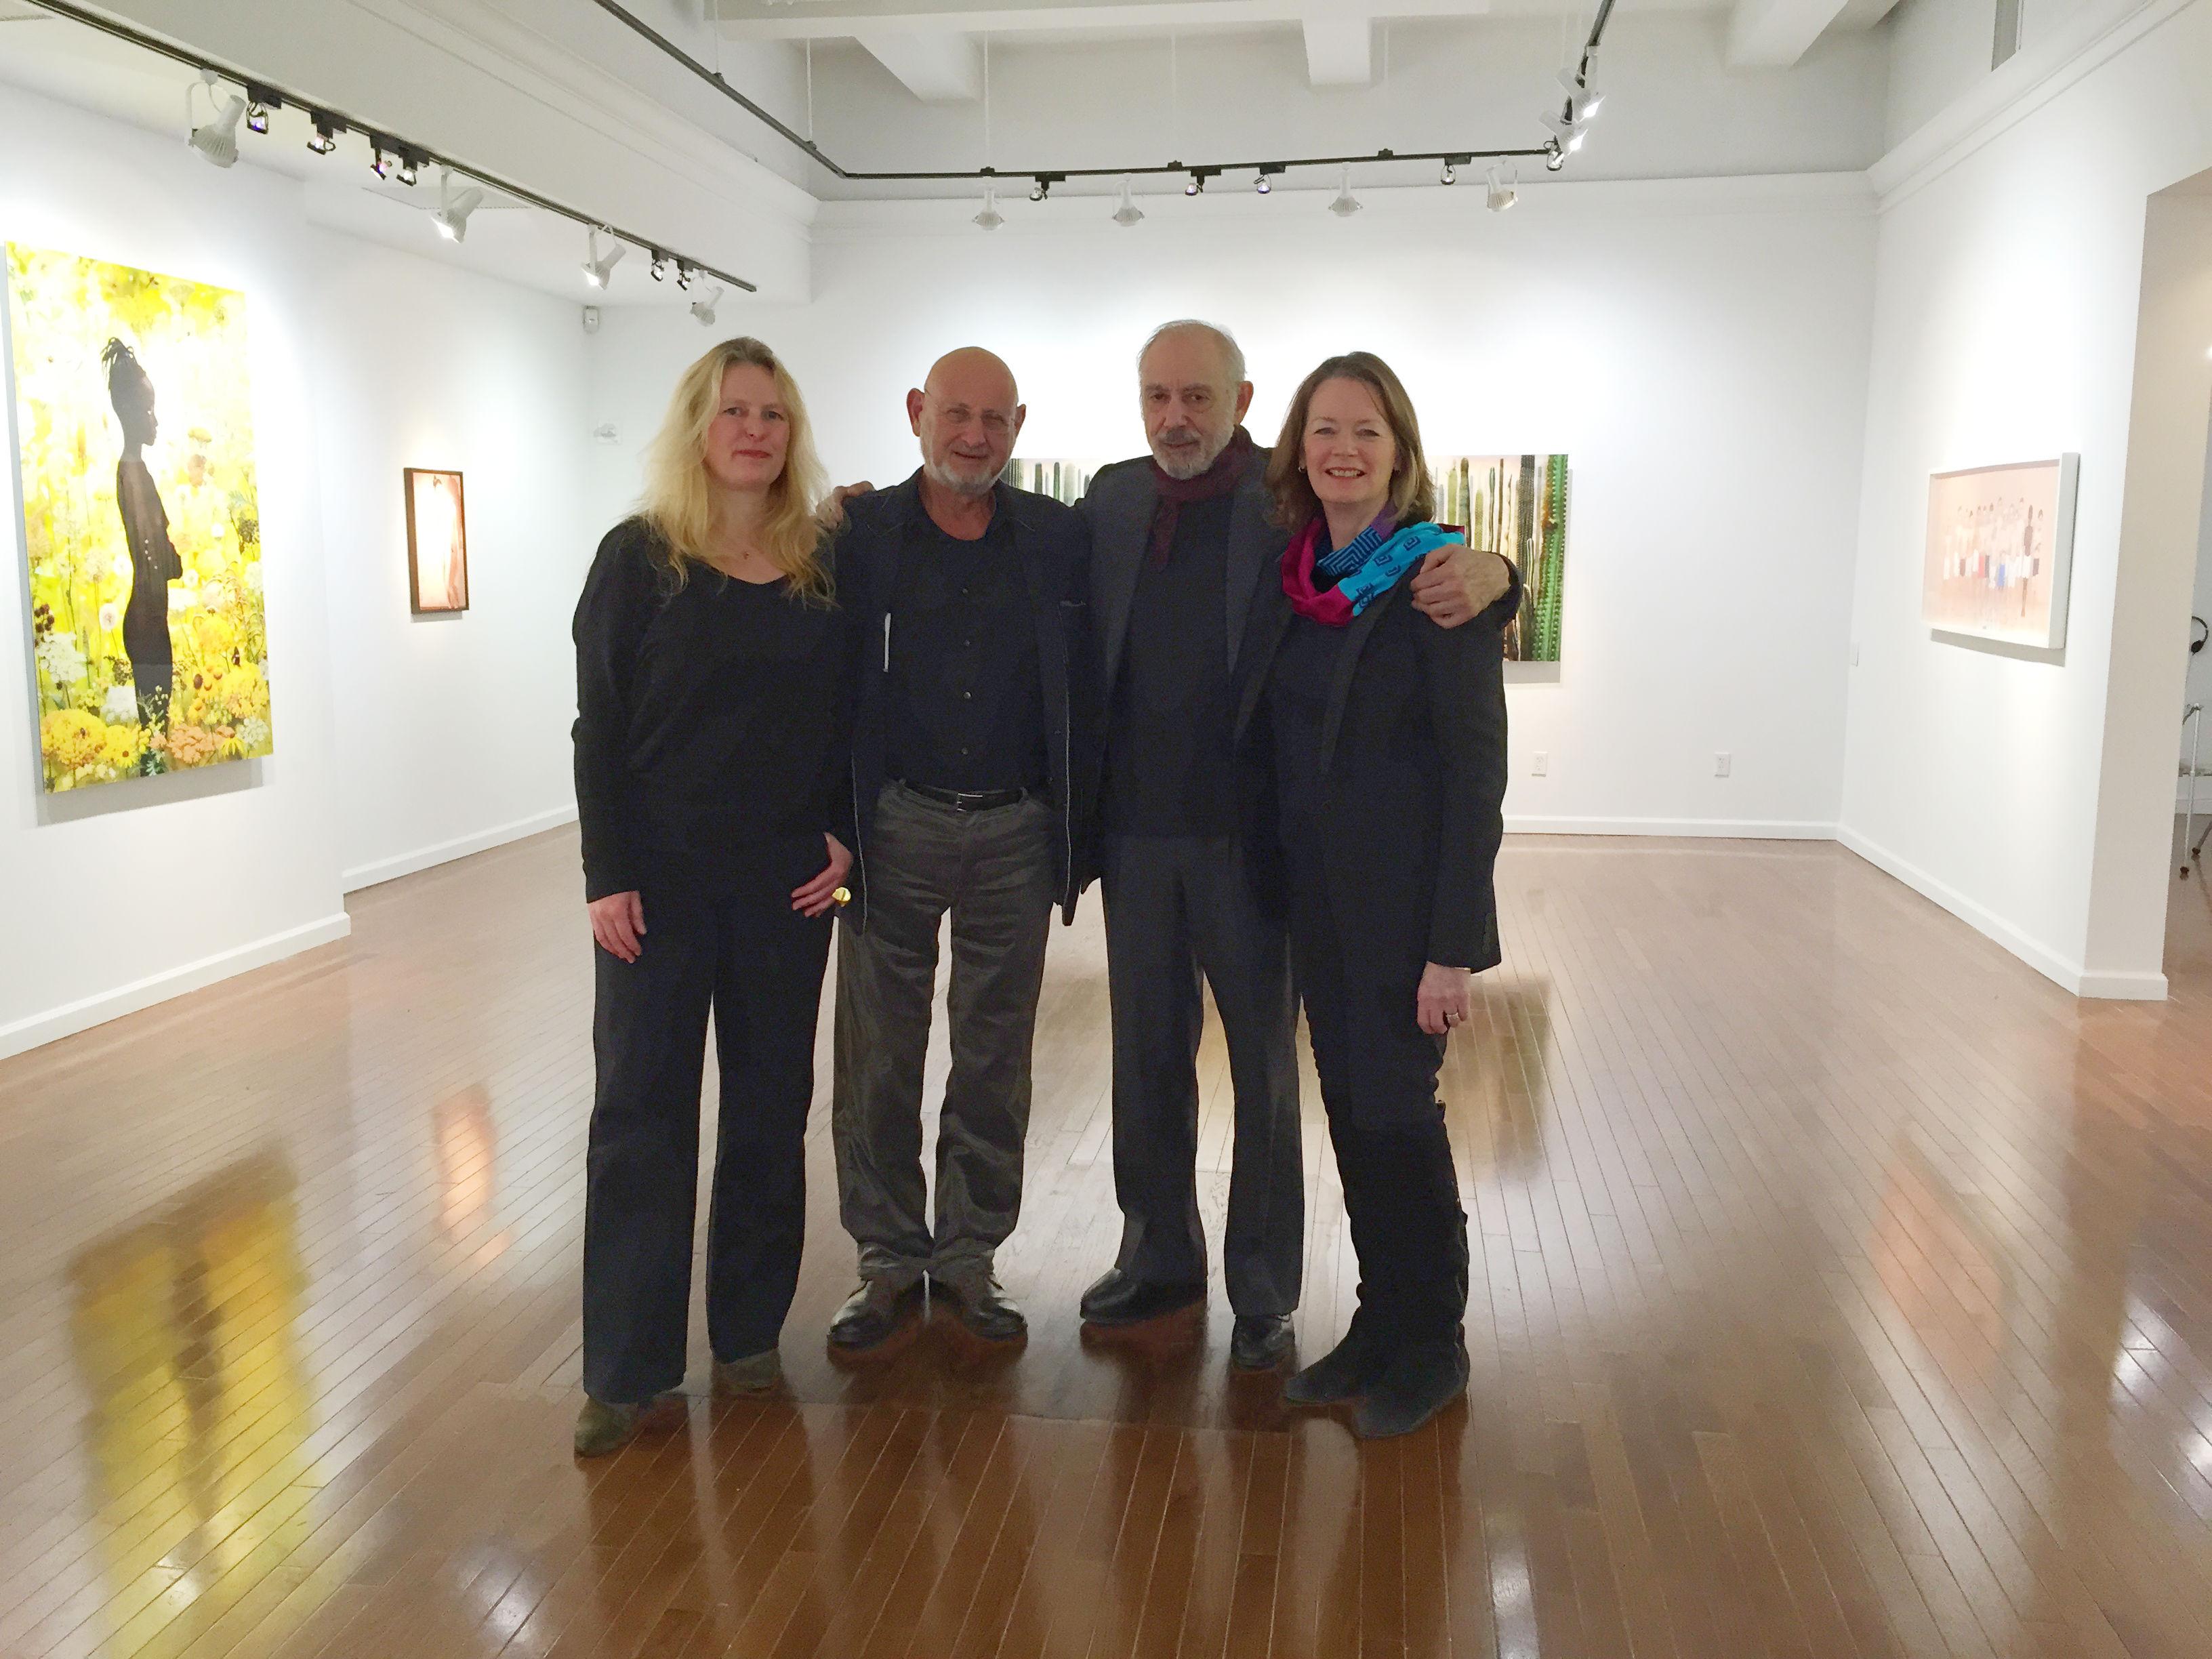 Andrea Schnabl, Stefan Stux, Stephen Haller, Cynthia Griffin Haller at Stux + Haller's new space on West 57th Street. (Photo by Alanna Martinez)